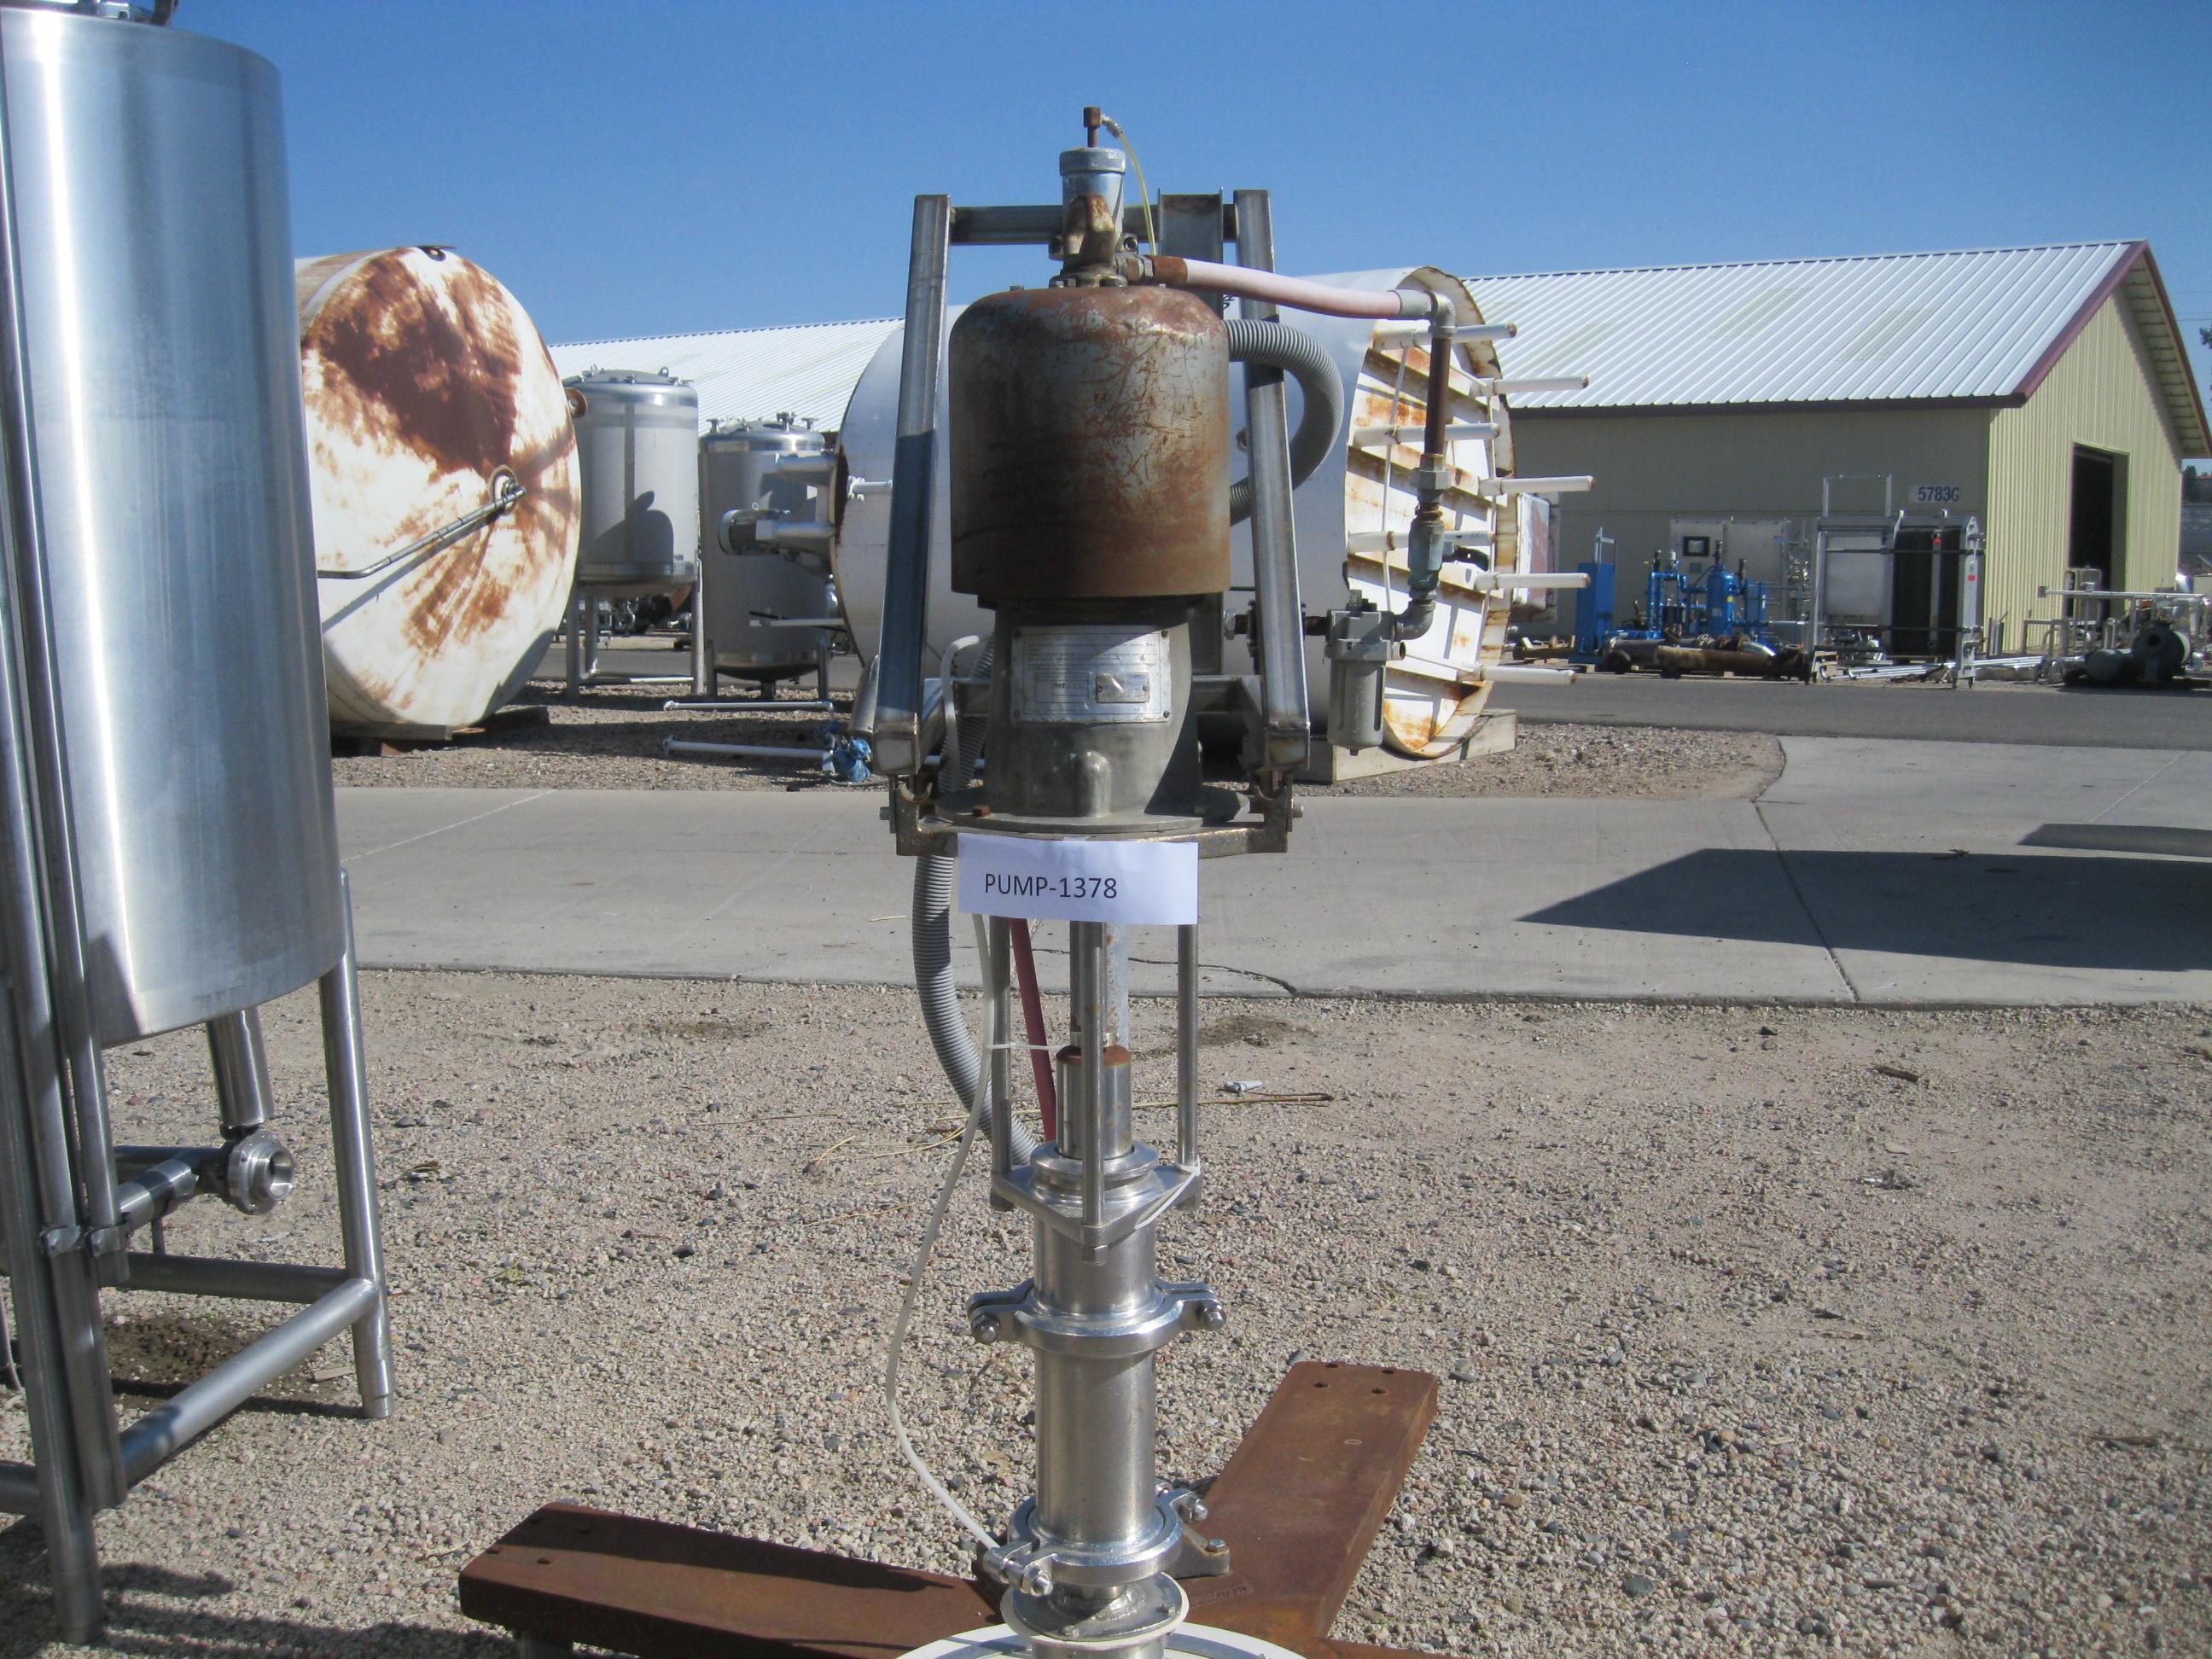 pump-1378.jpg